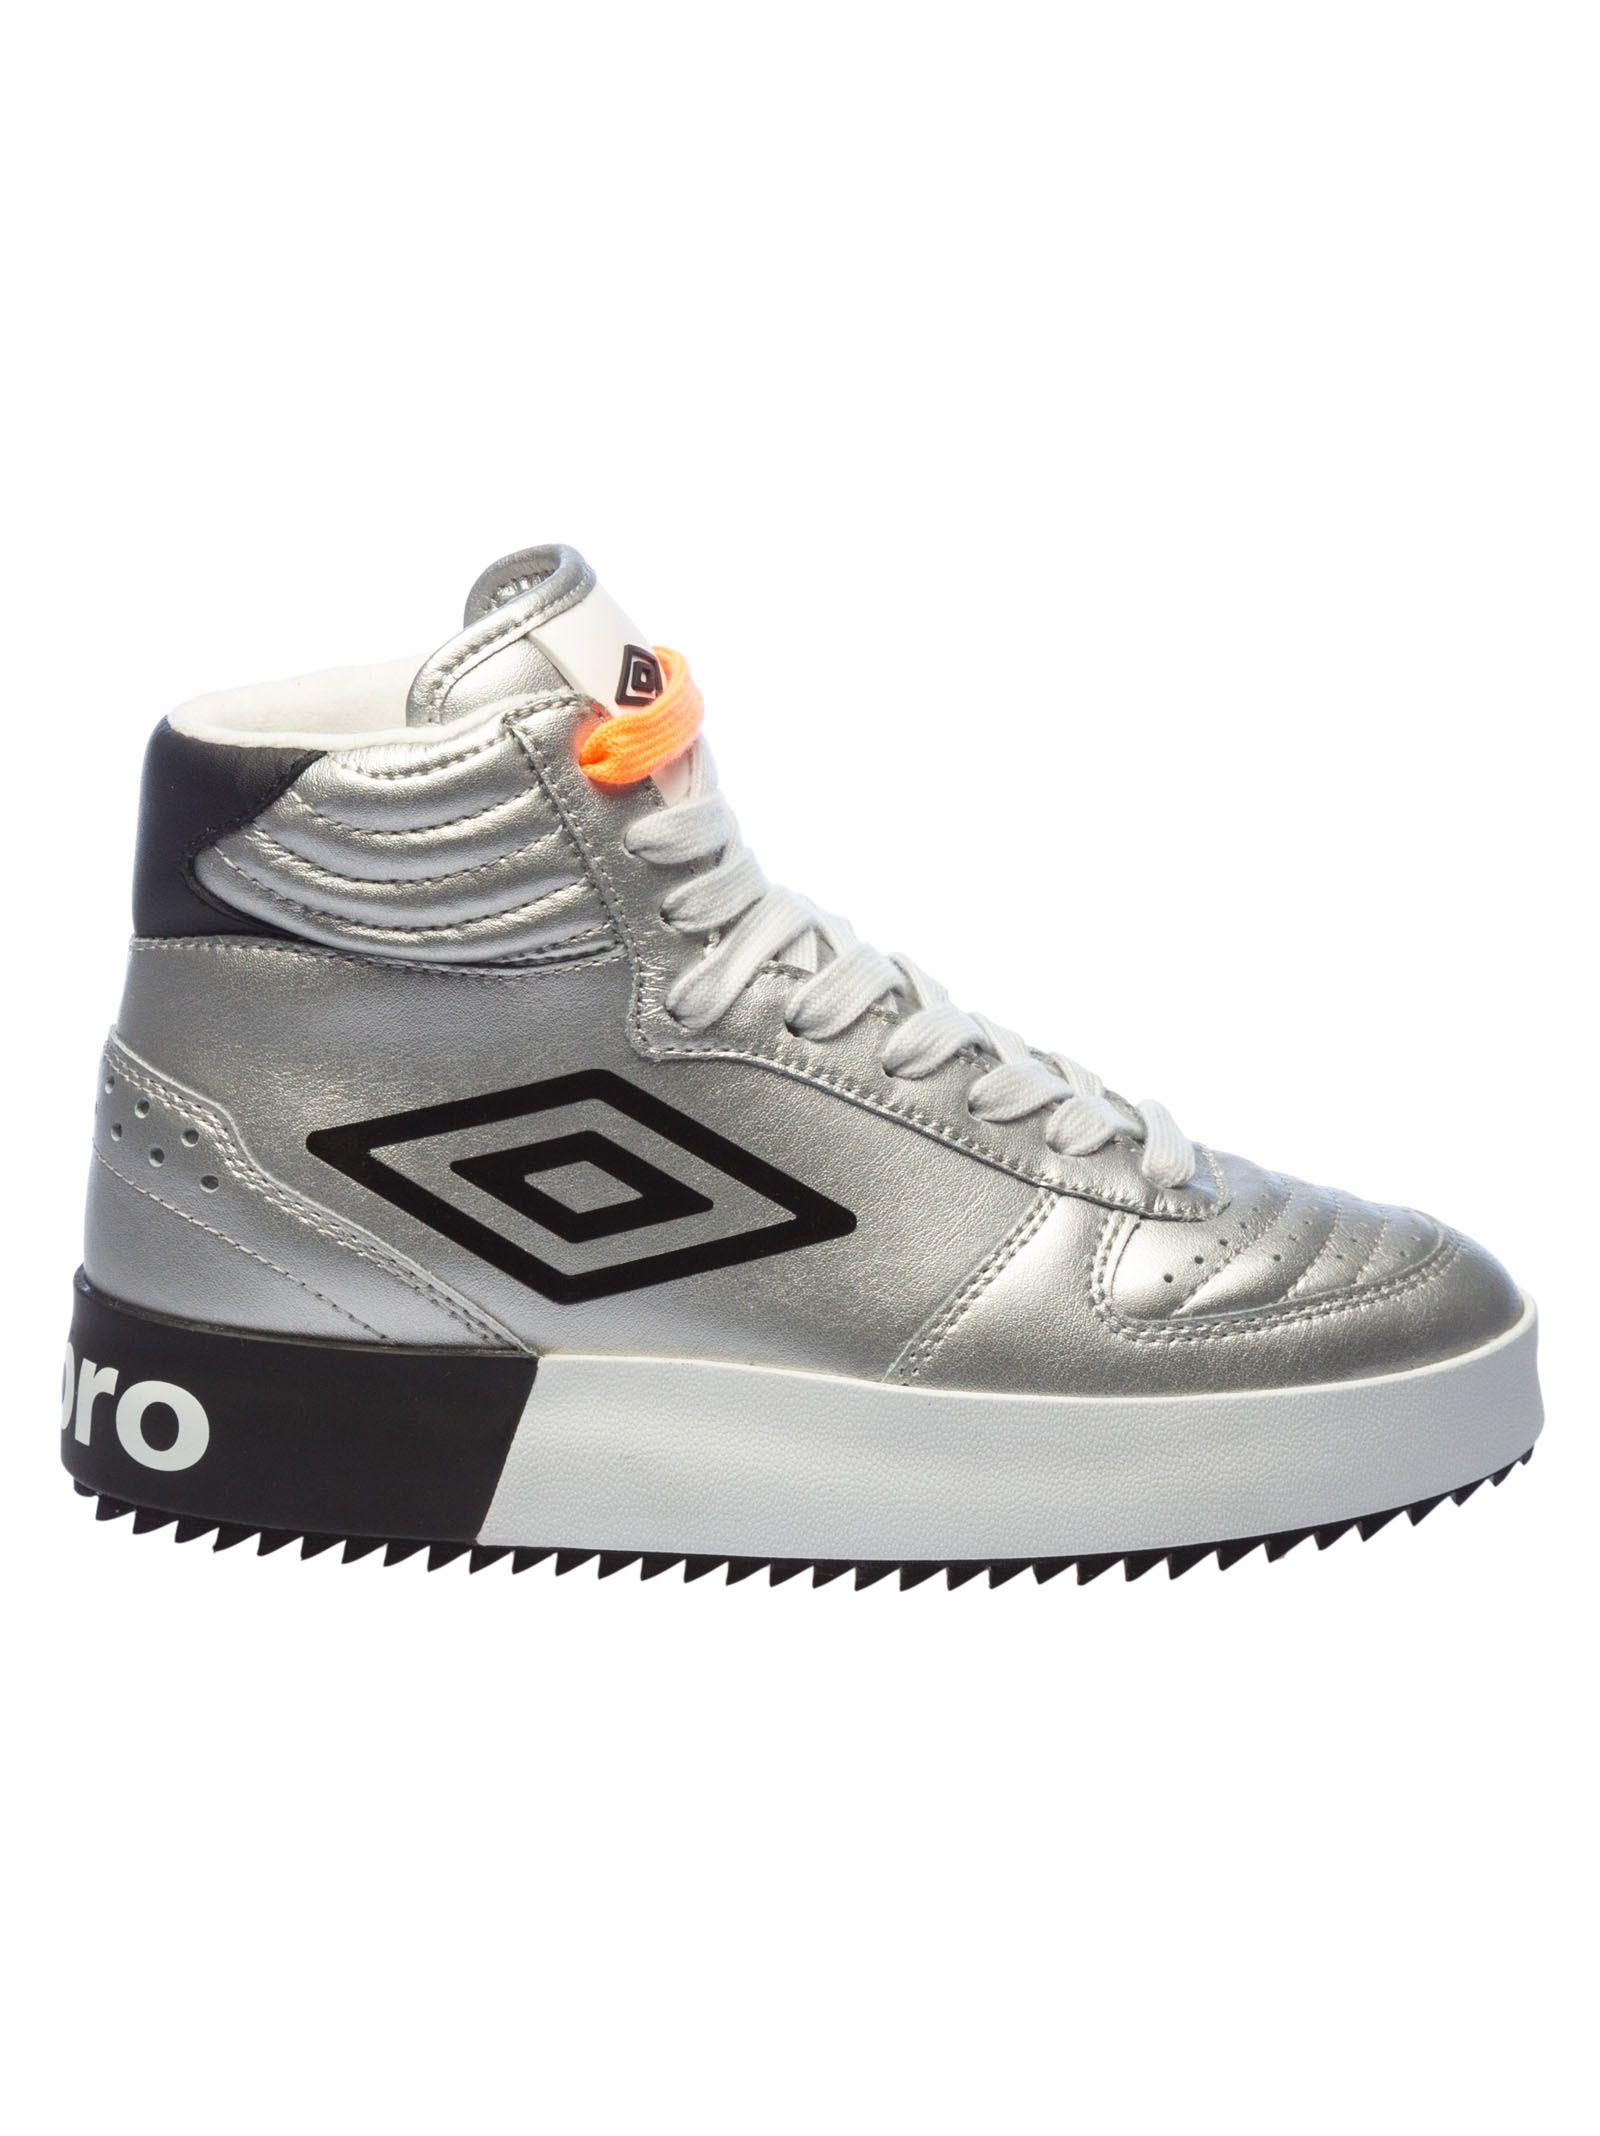 UMBRO Side Logo Basketball Sneakers in Silver